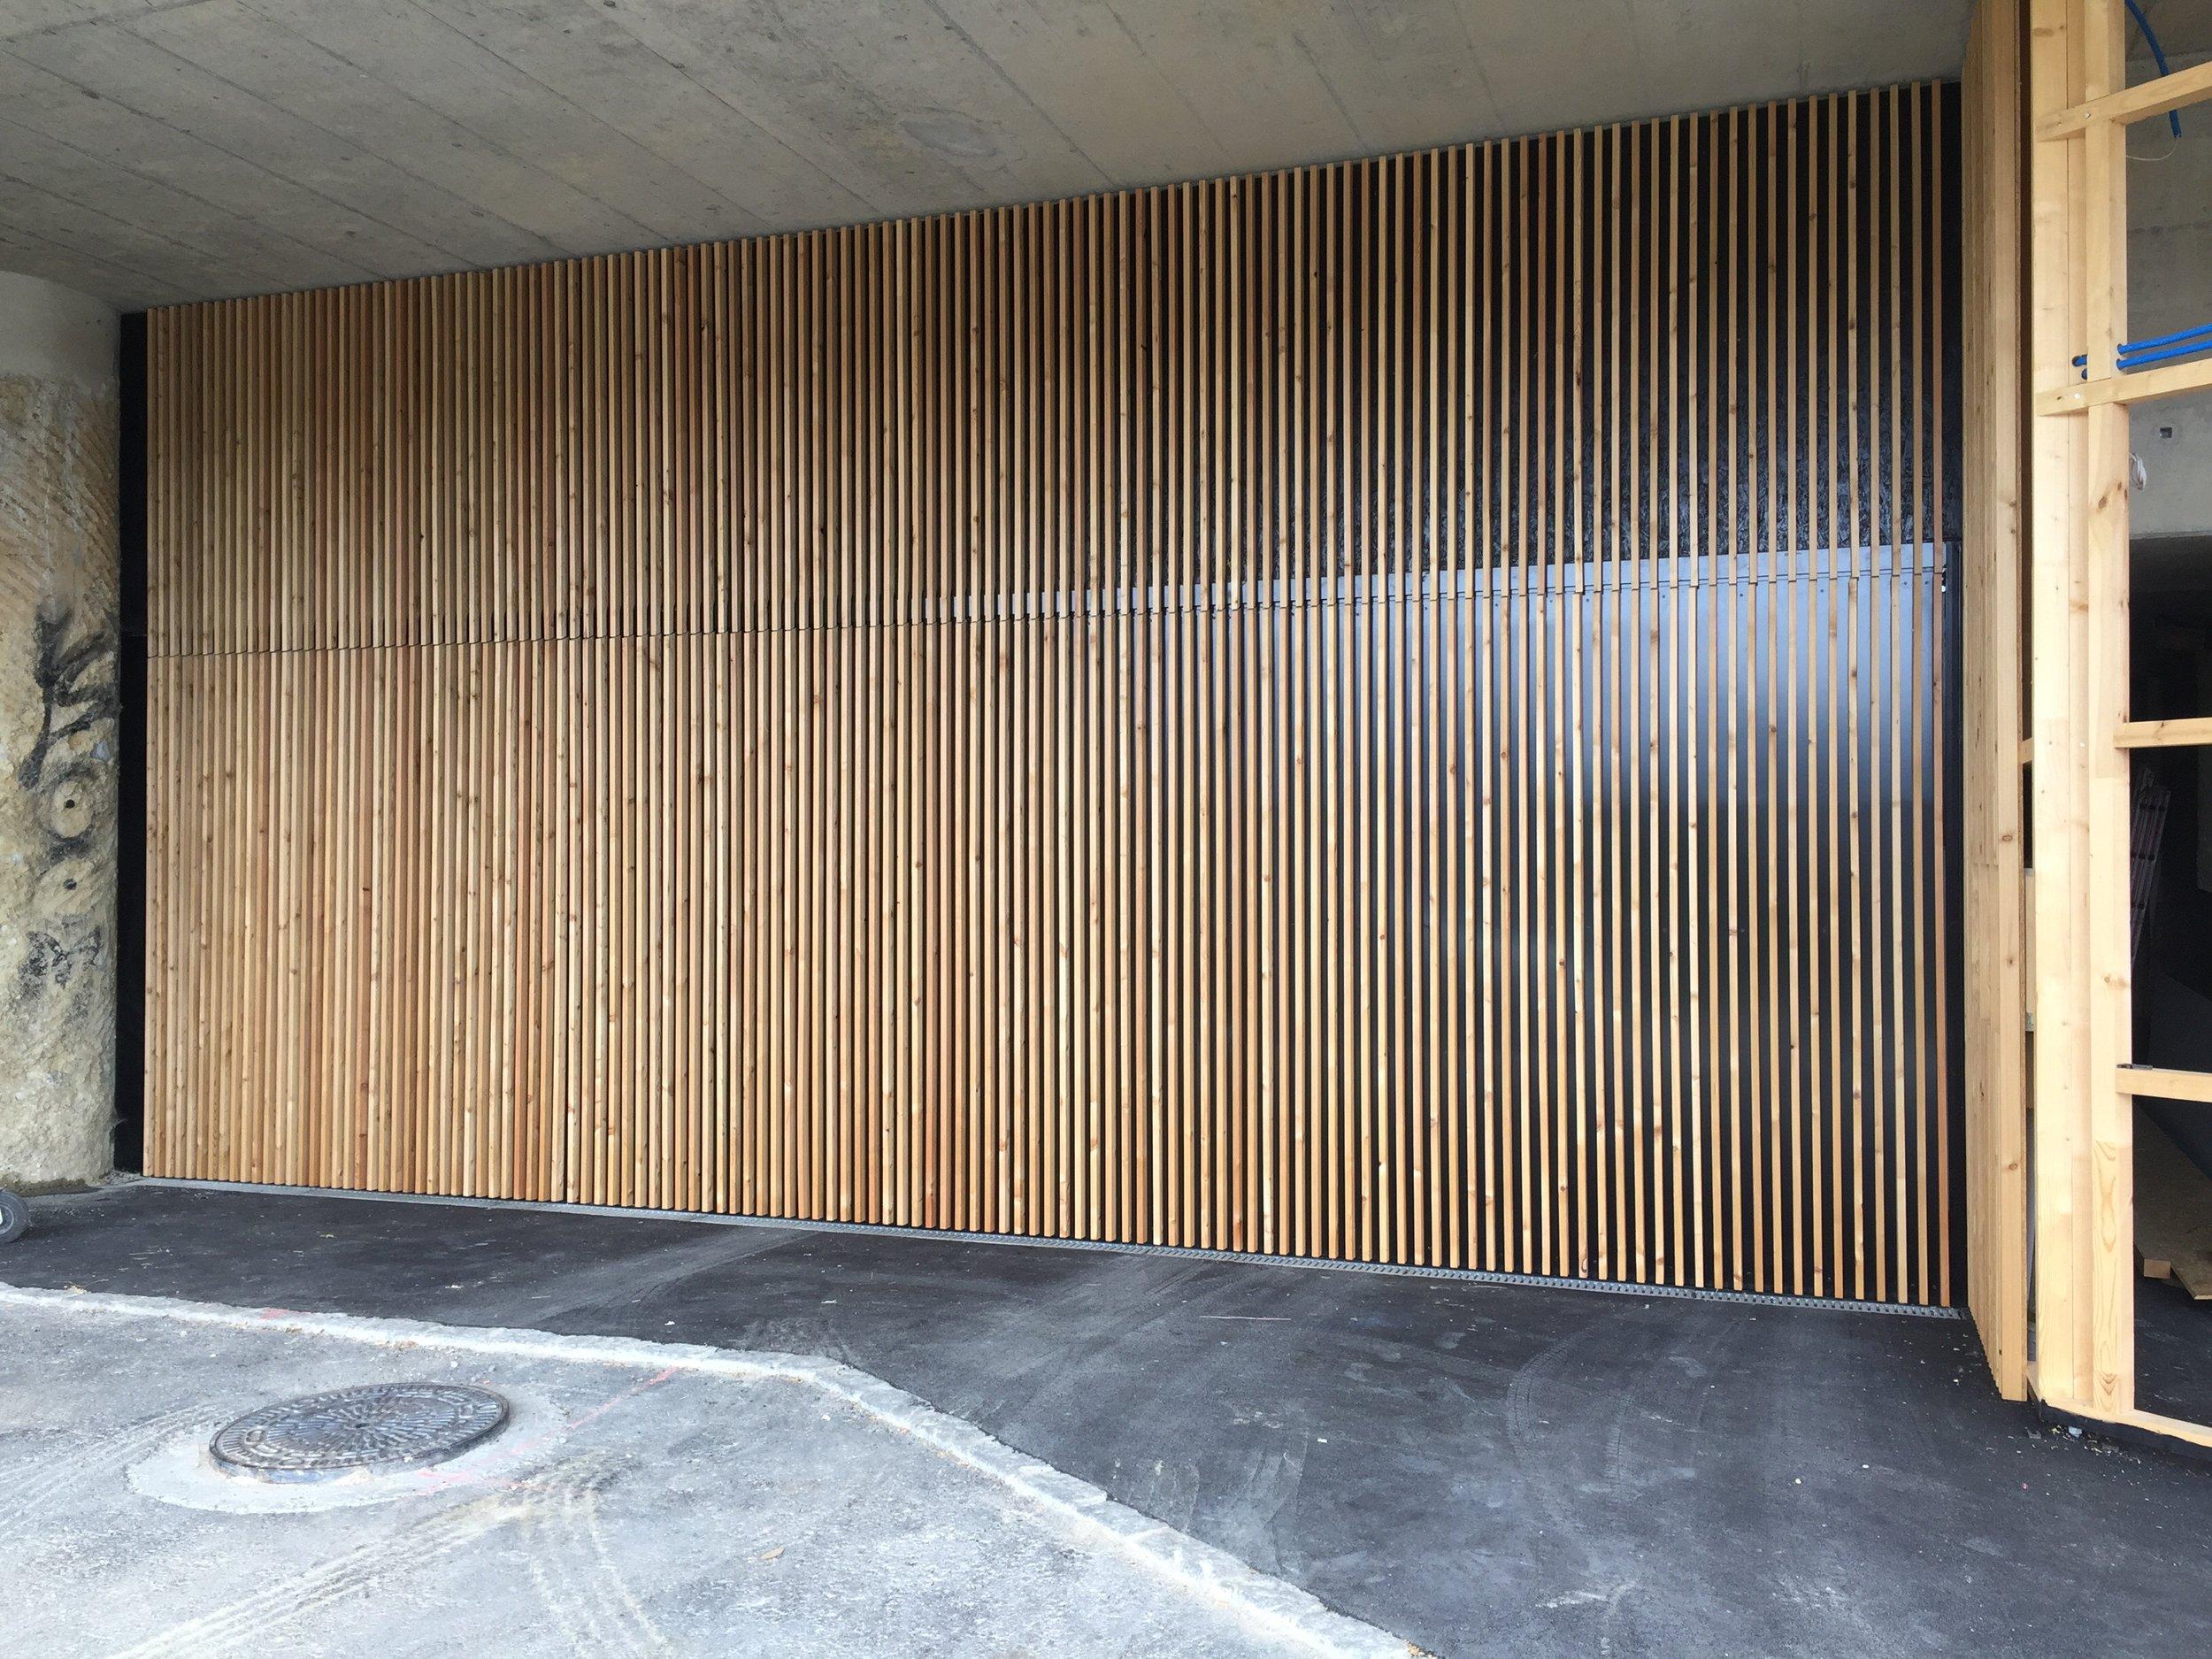 Kipptor mit Holzfüllung analg Fassade.jpg